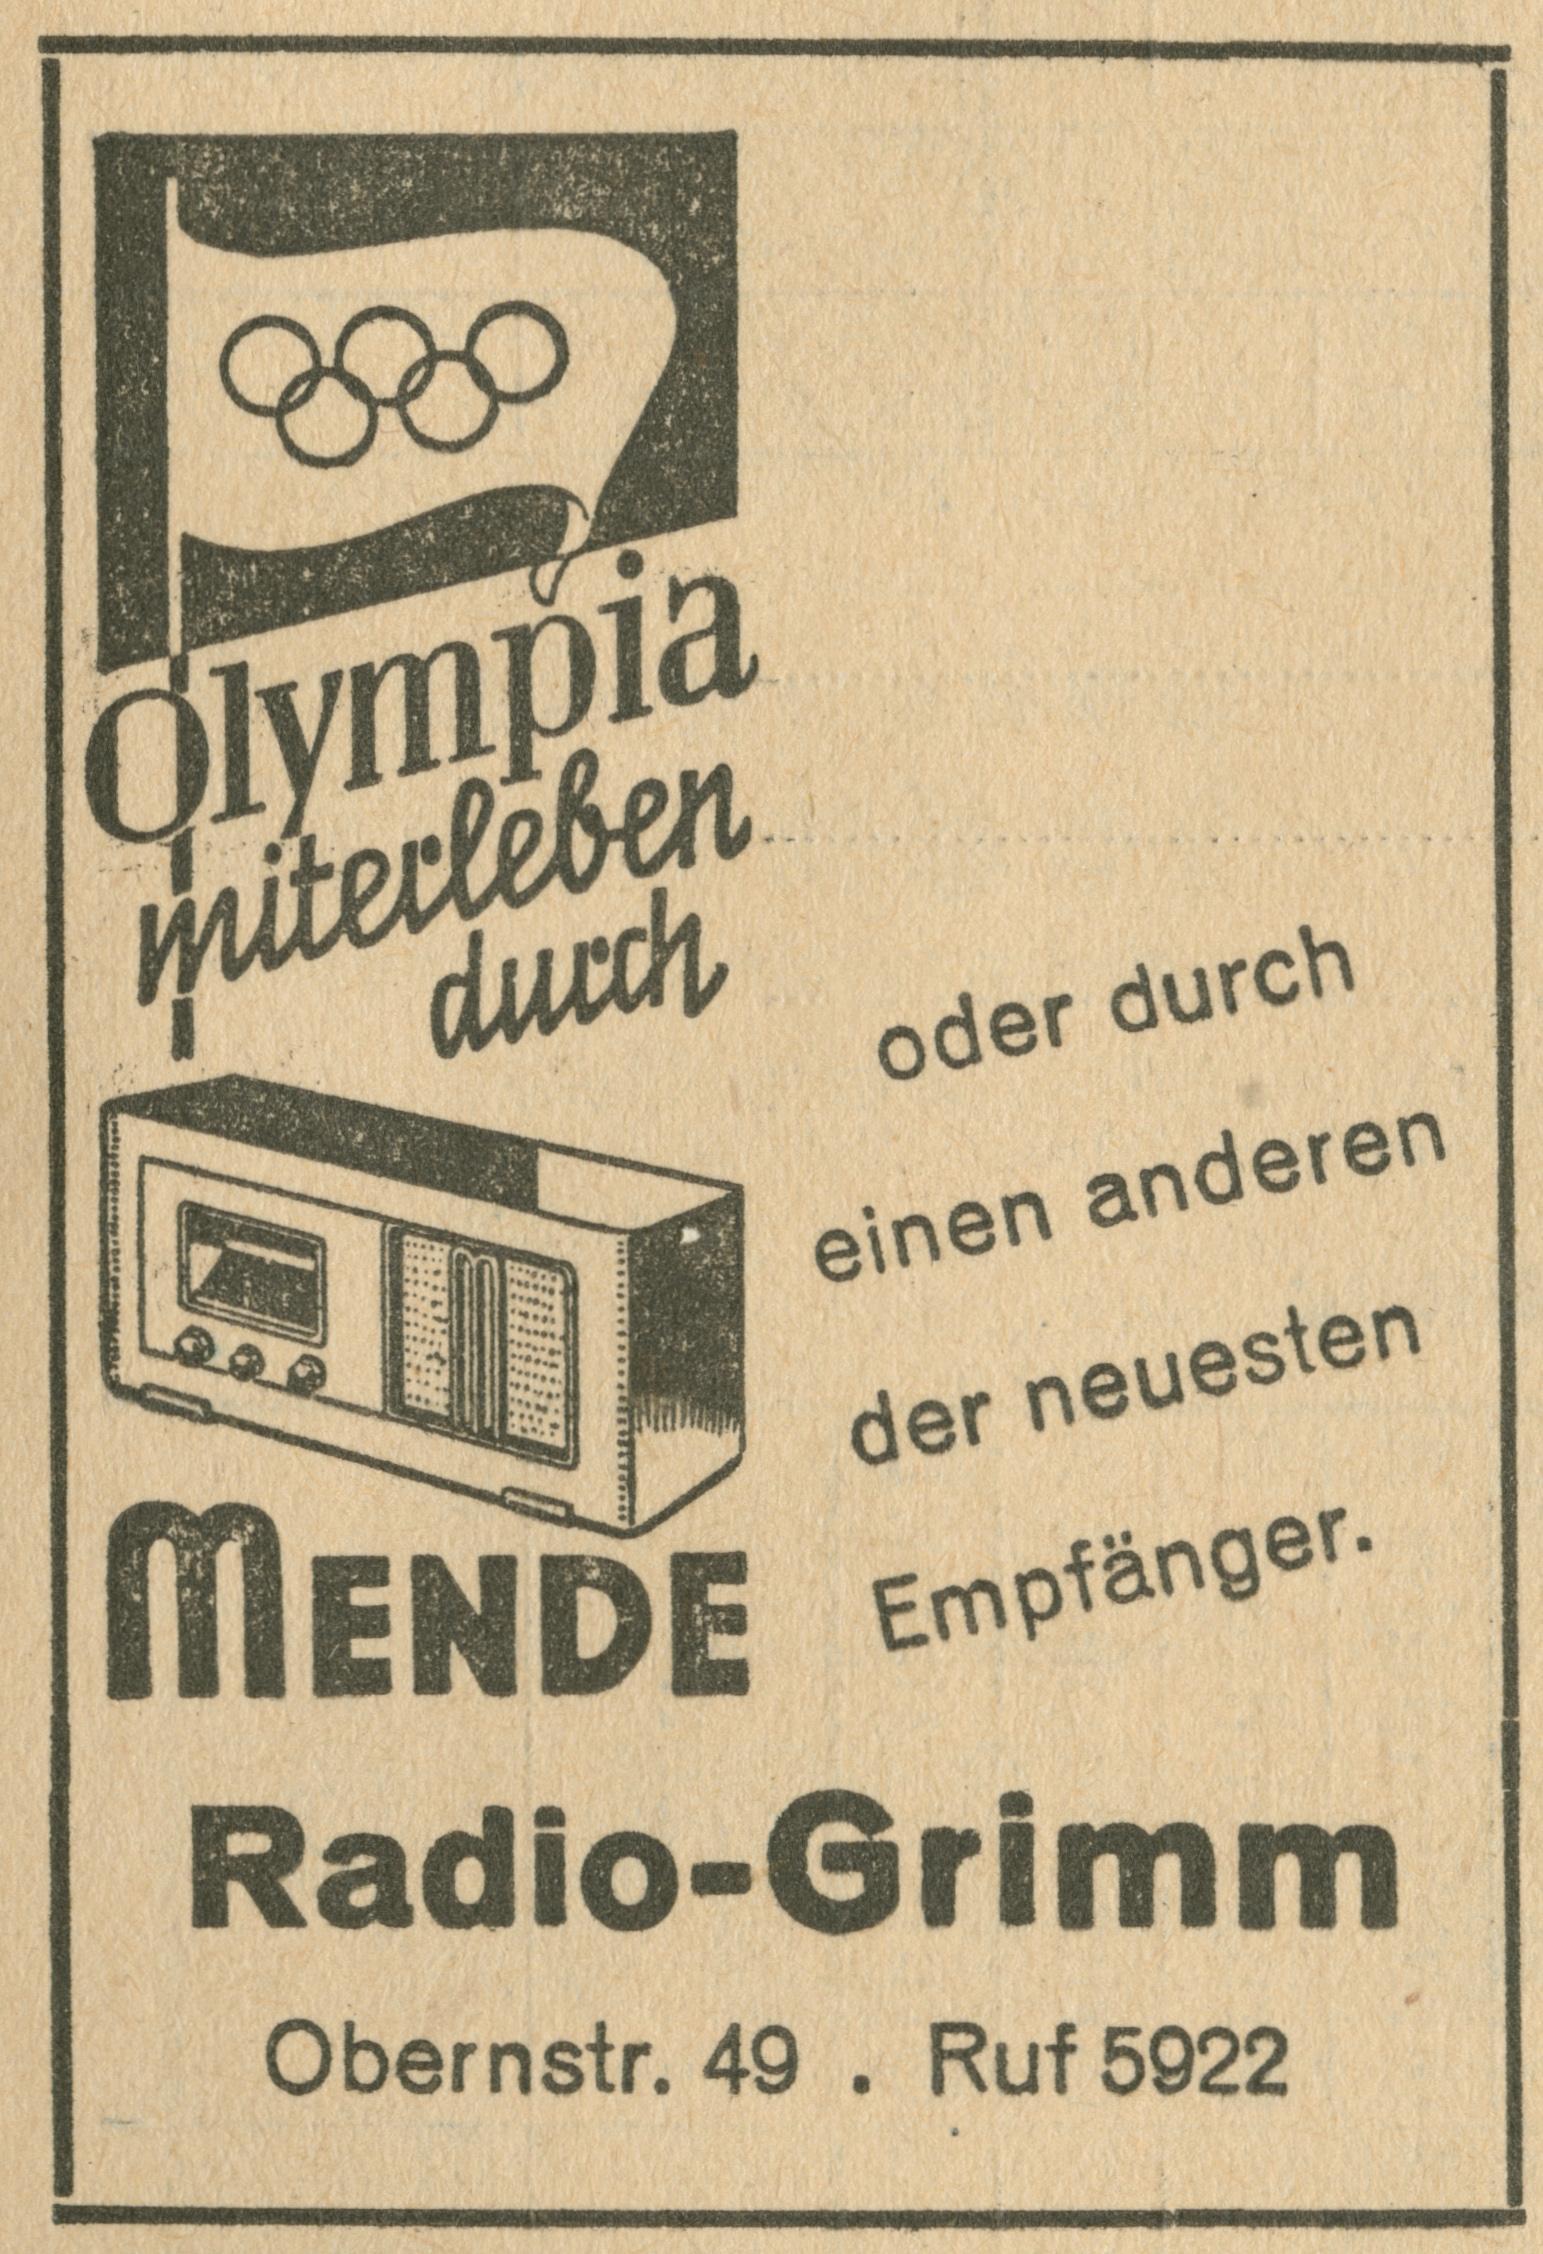 4. Radio Grimm doppelgroß